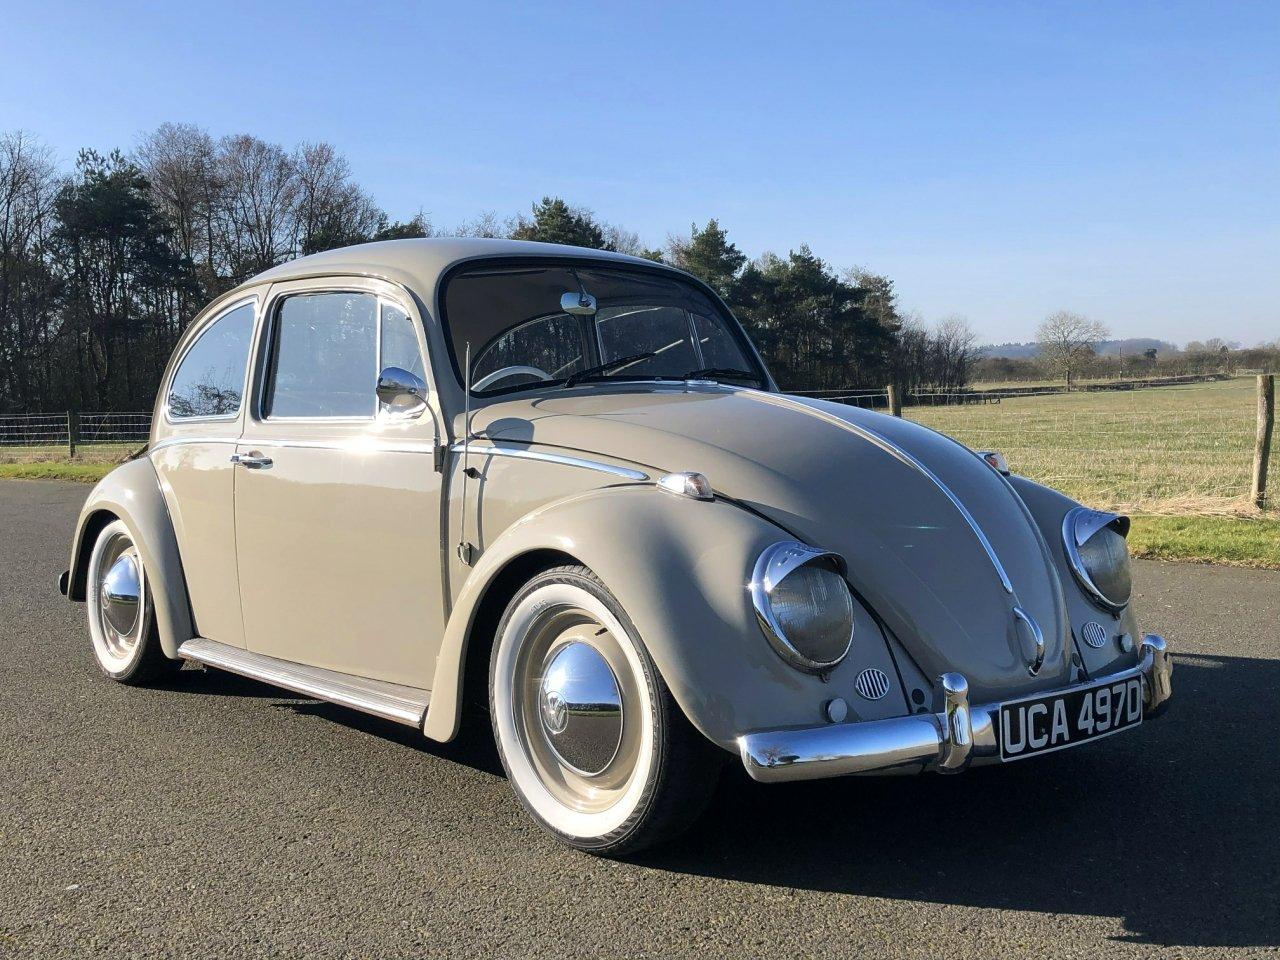 1966 Volkswagen Beetle 1600cc SOLD (picture 3 of 6)